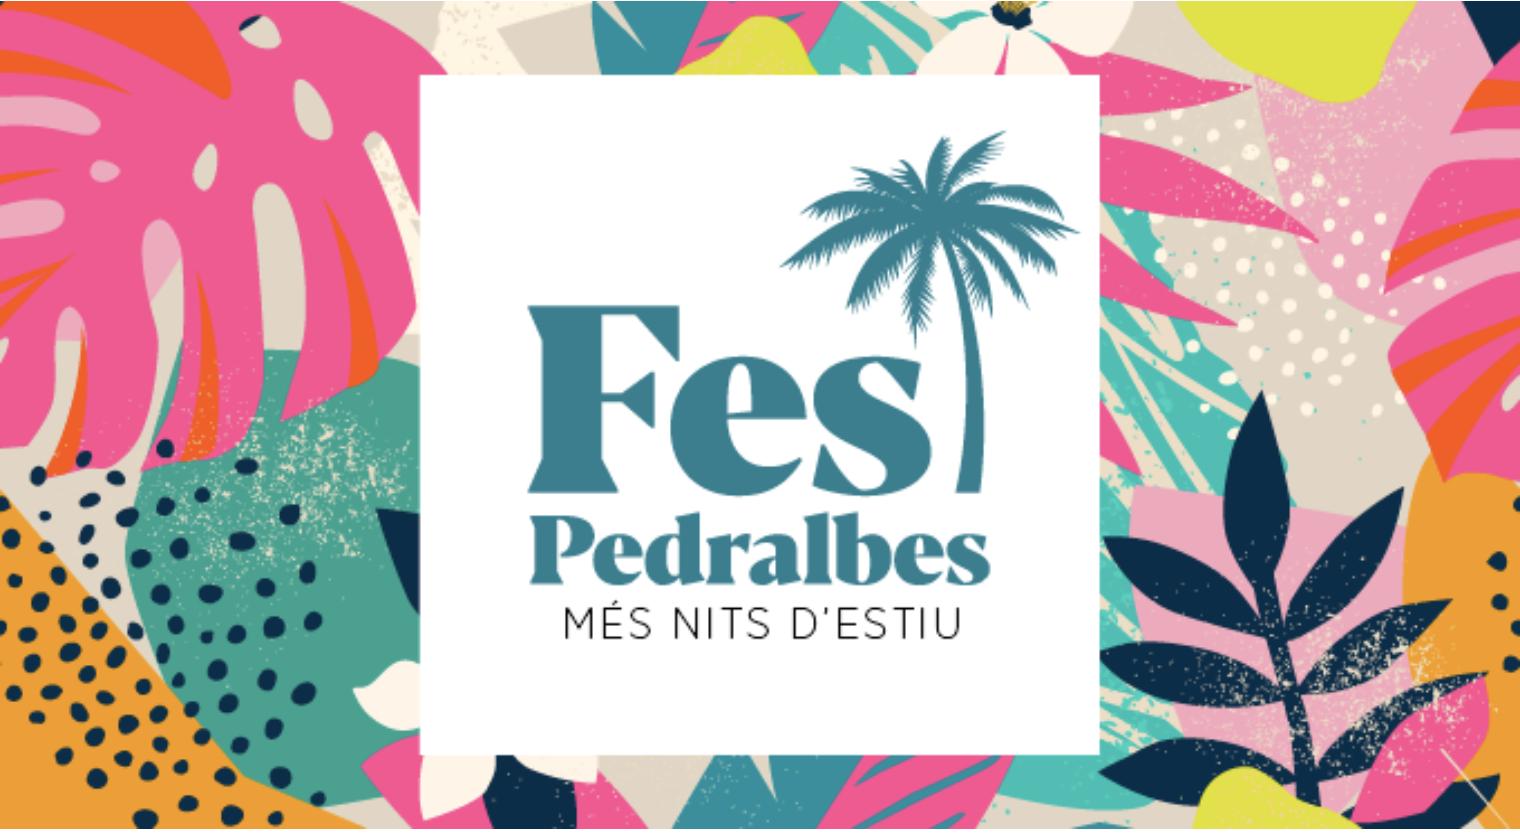 Fest Pedralbes 2020